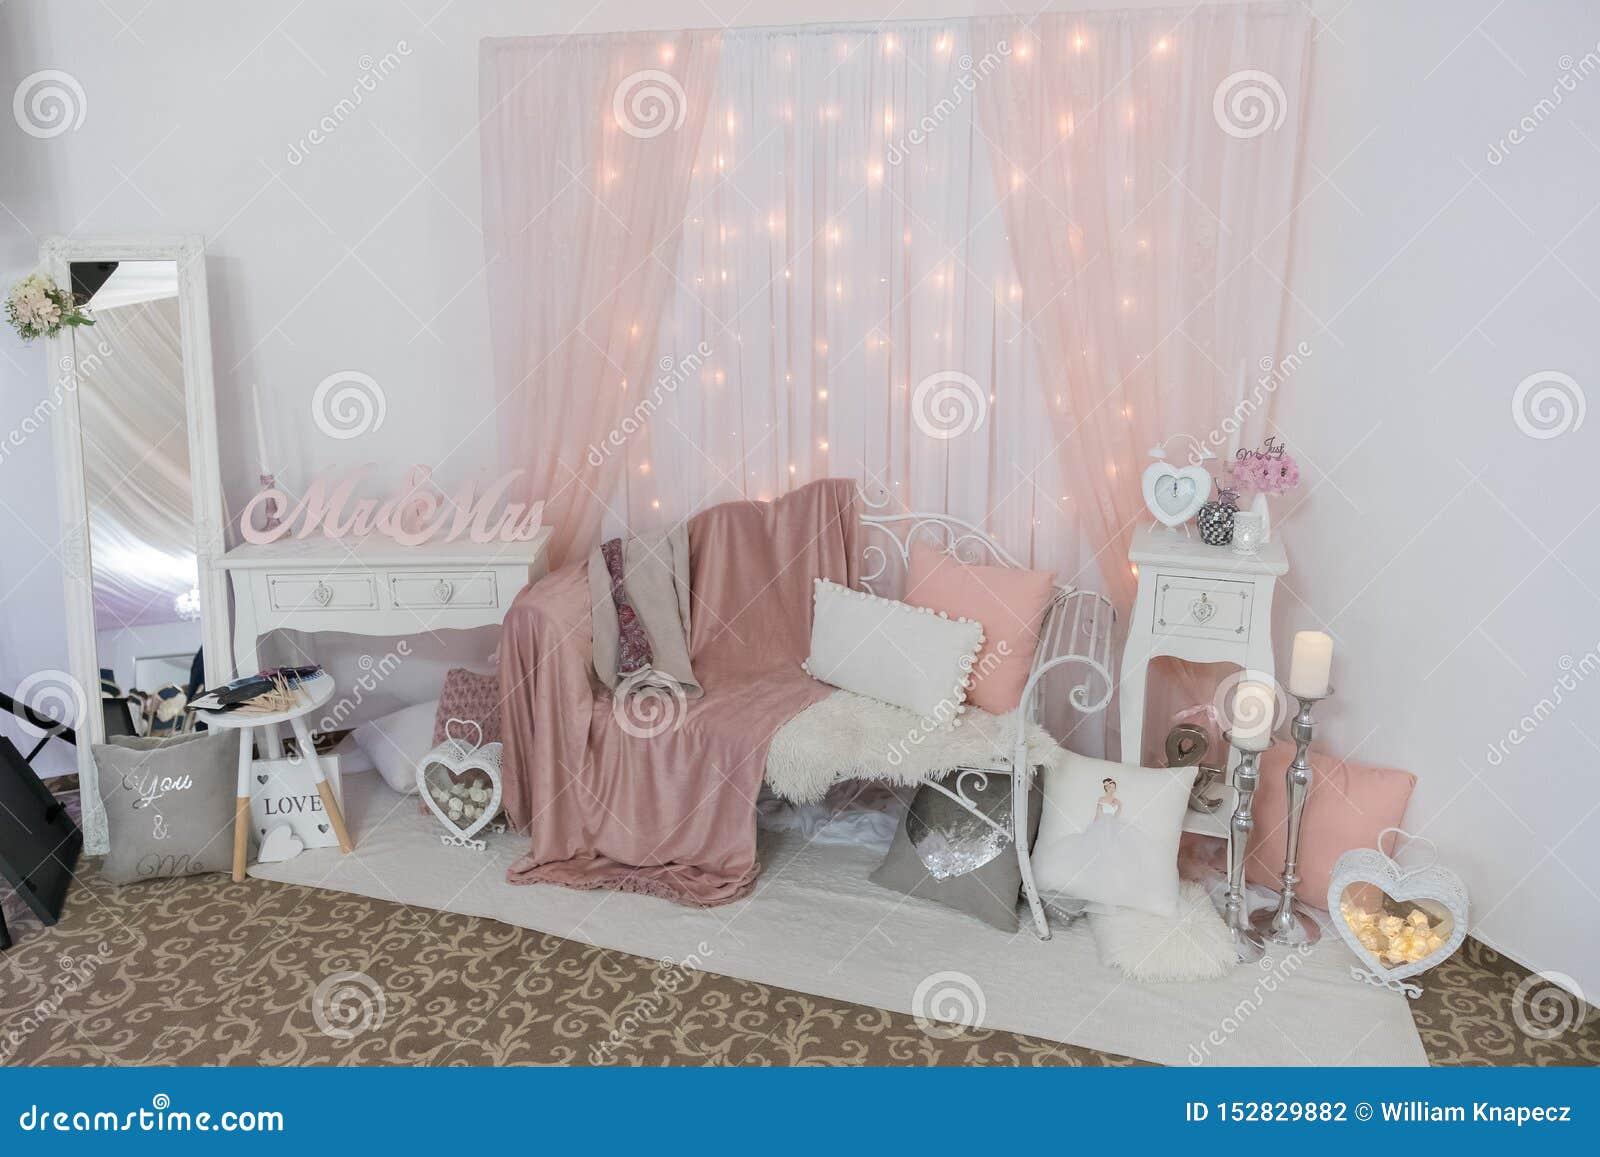 Elegant corner arrangement with clock and candles